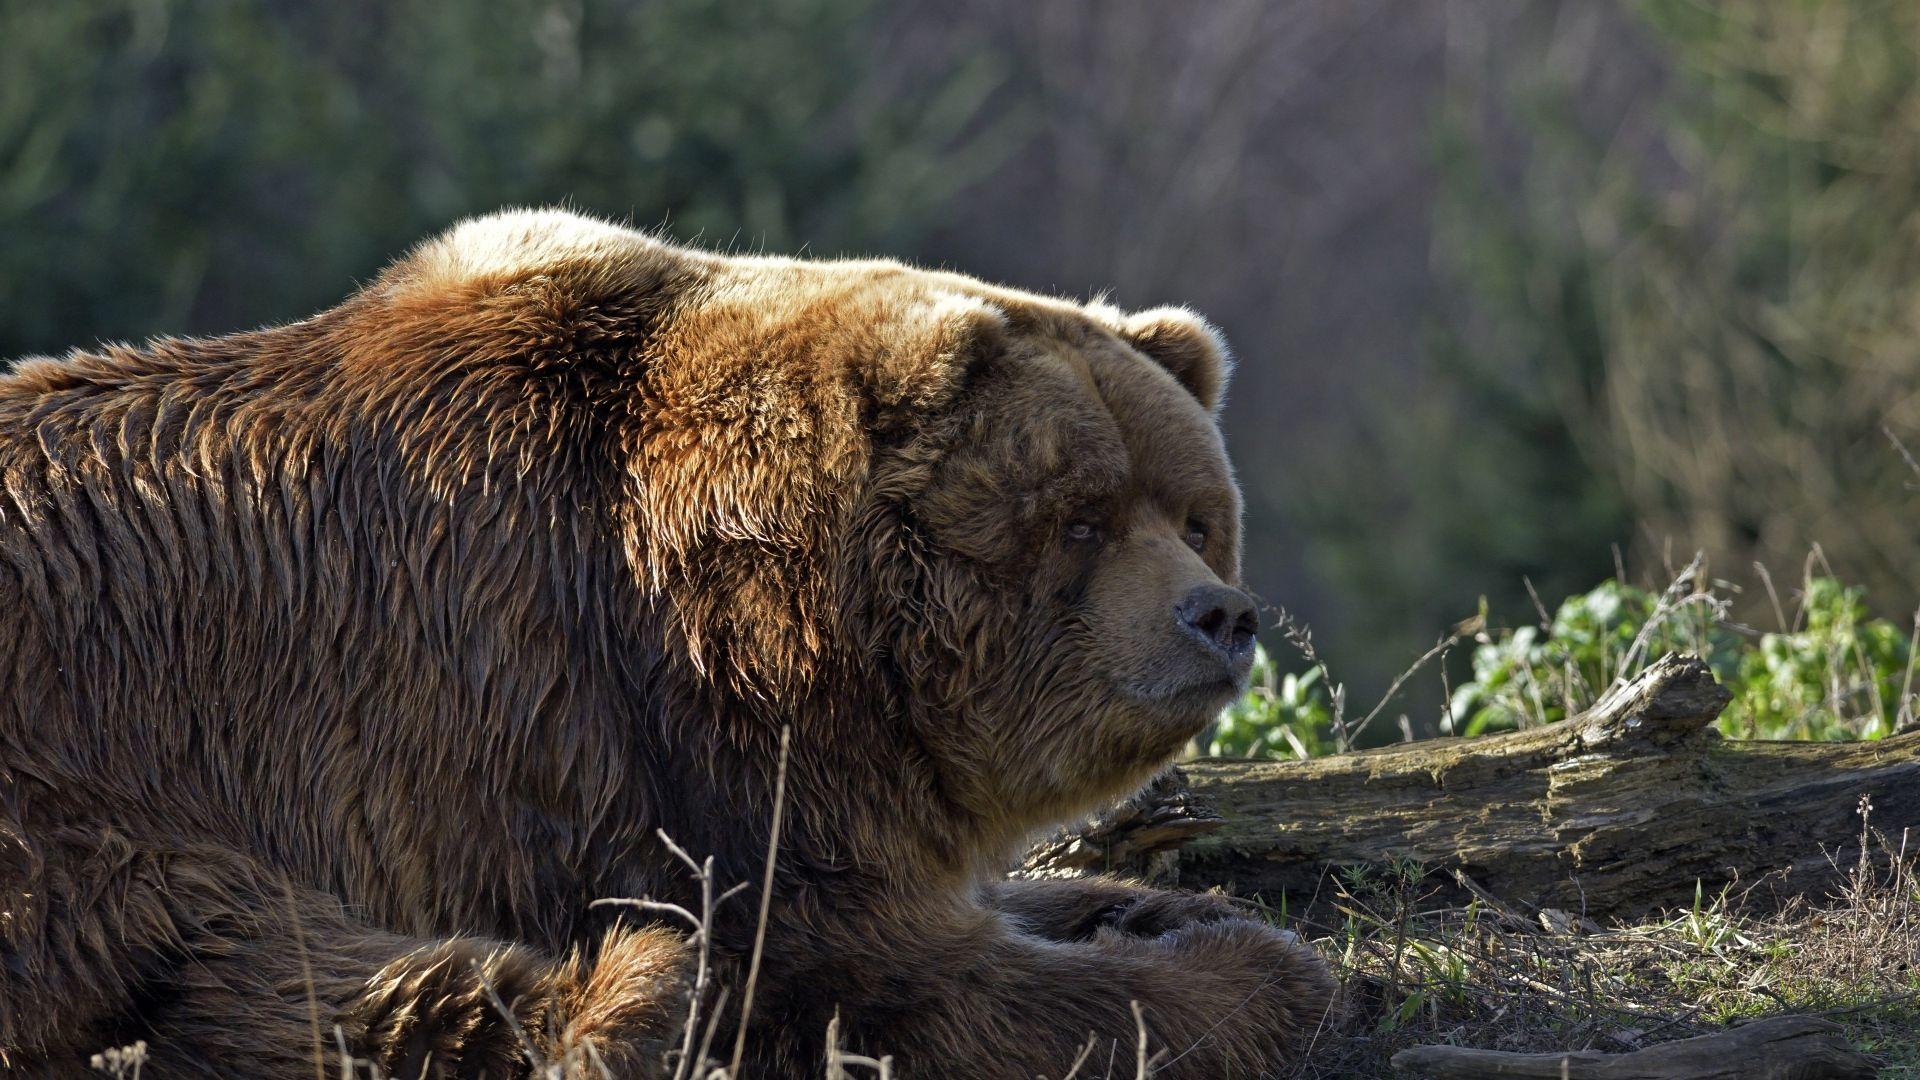 A Fat Brown Bear